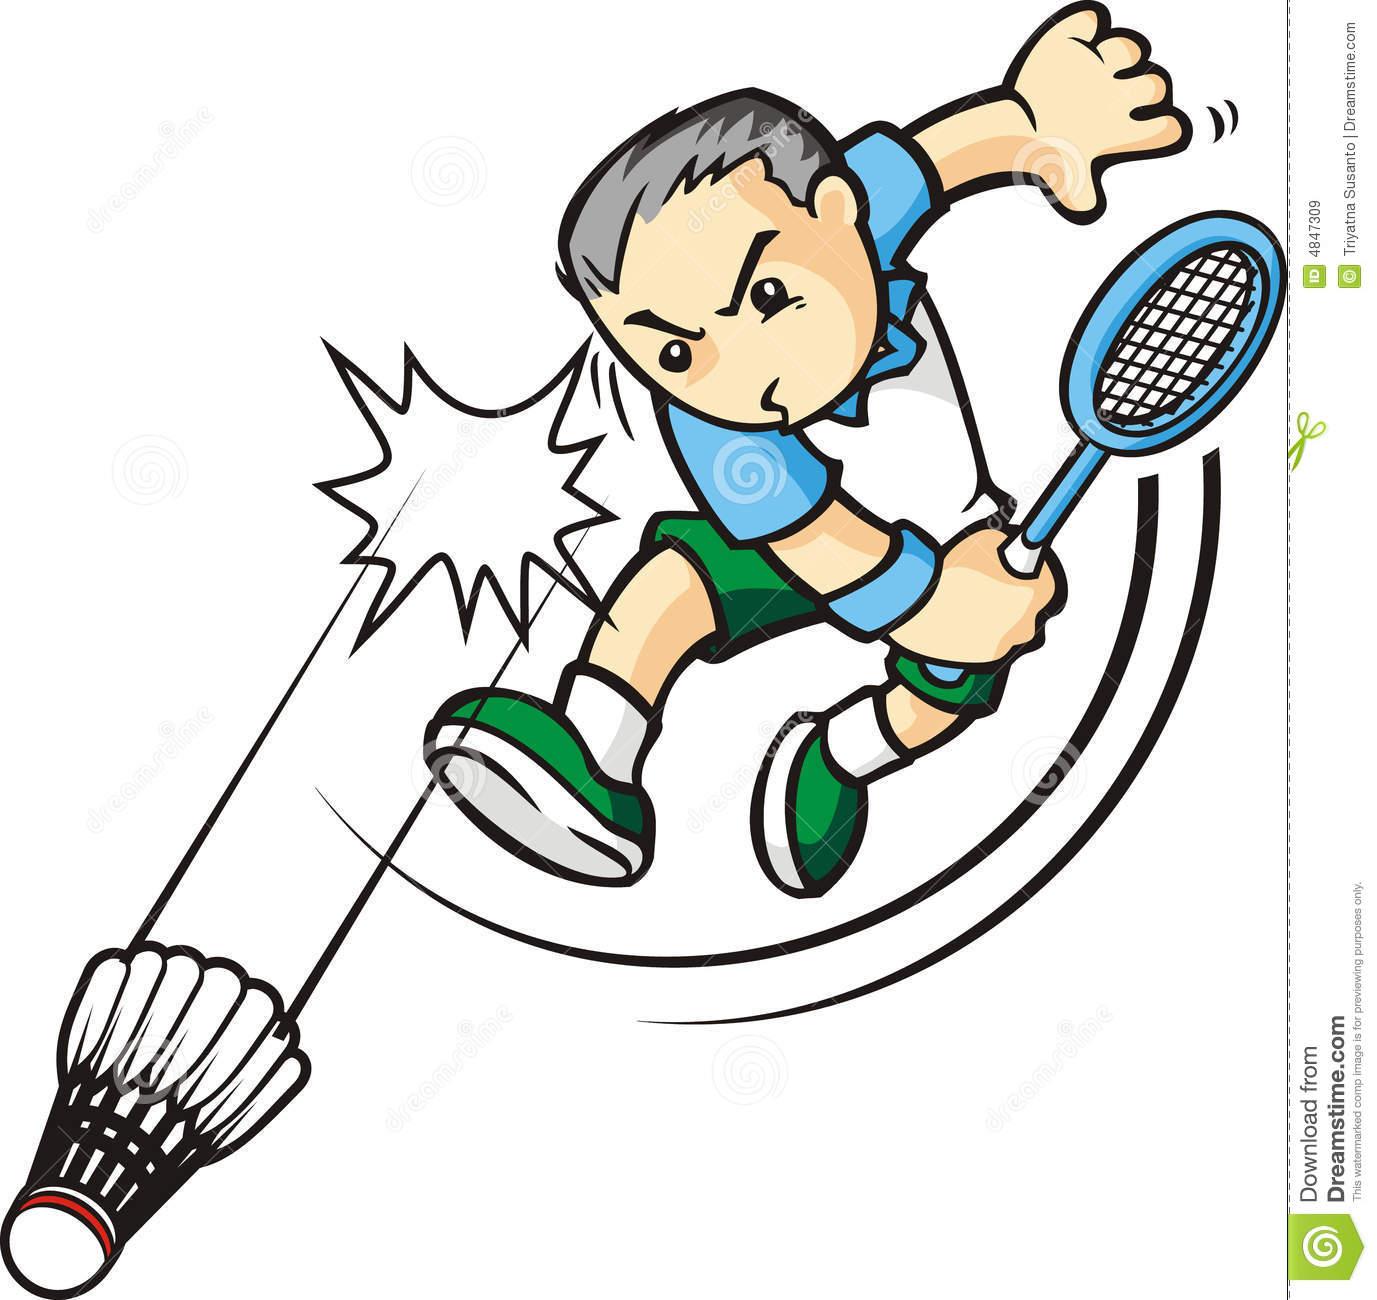 sport cartoon clipart clipart suggest baseball player clipart images free baseball player clip art free printable